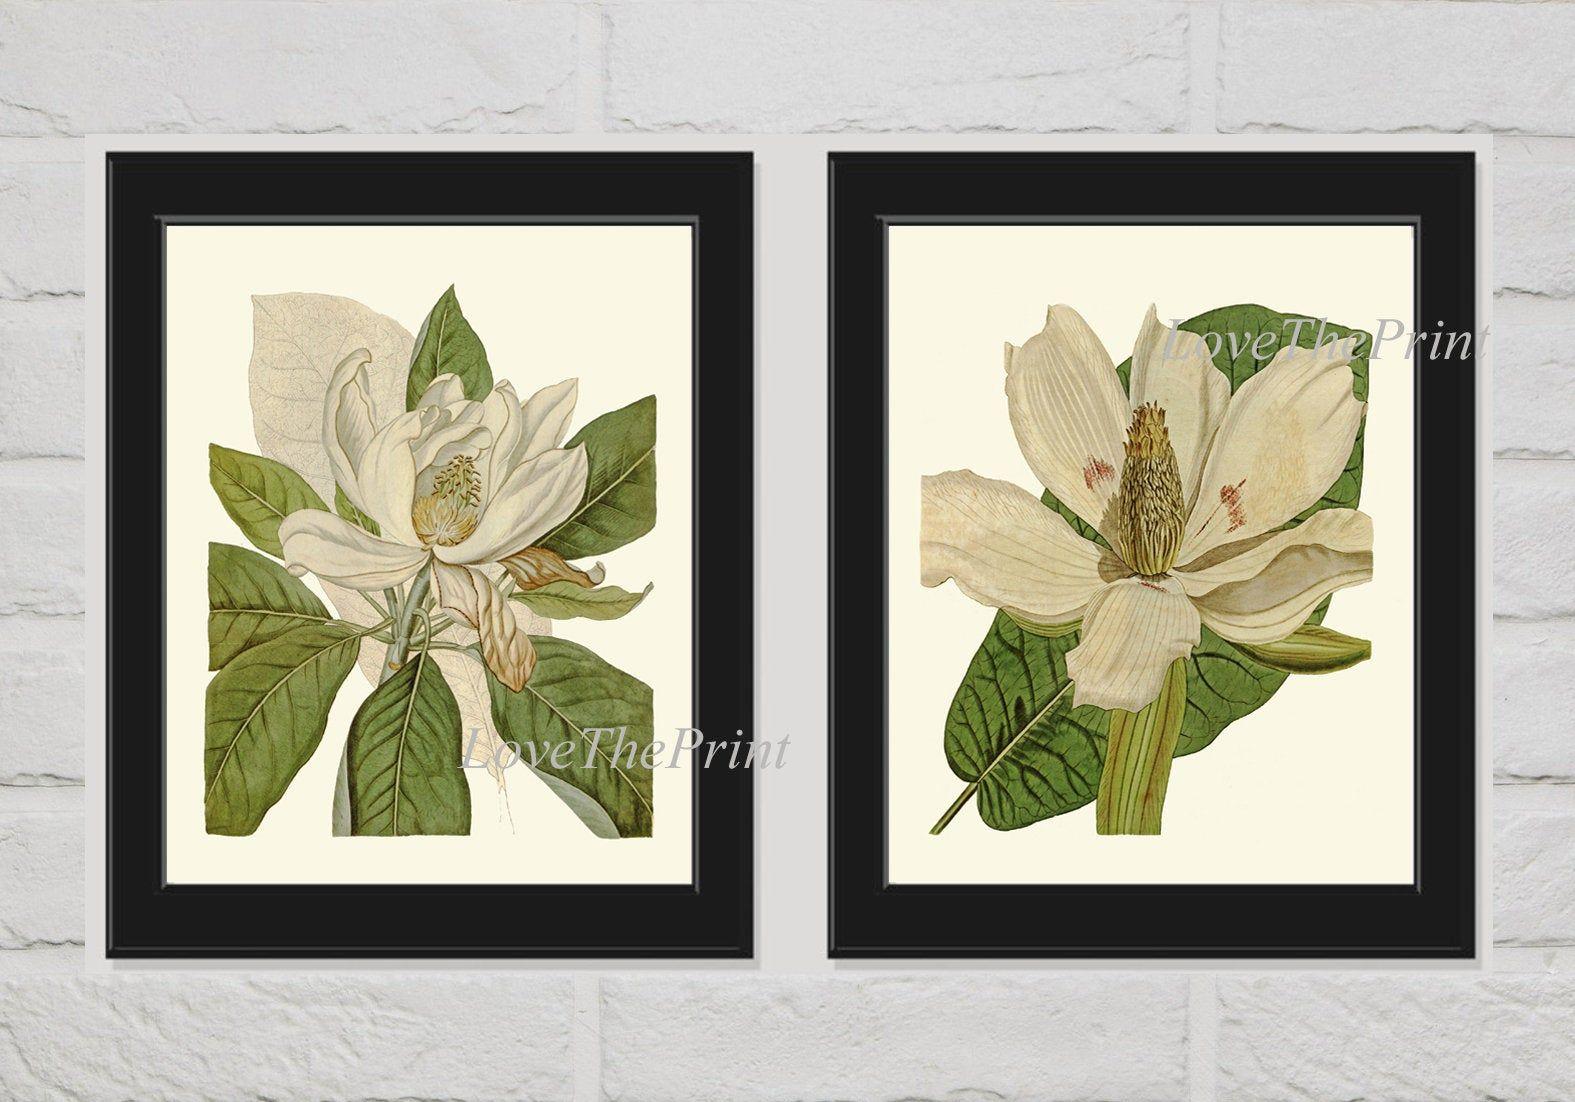 Magnolia Flower Print 11x14 Watercolor White Flower Painting 8x10 Floral Decor Botanical Art Wall Decor 4x6 5x7 Print,